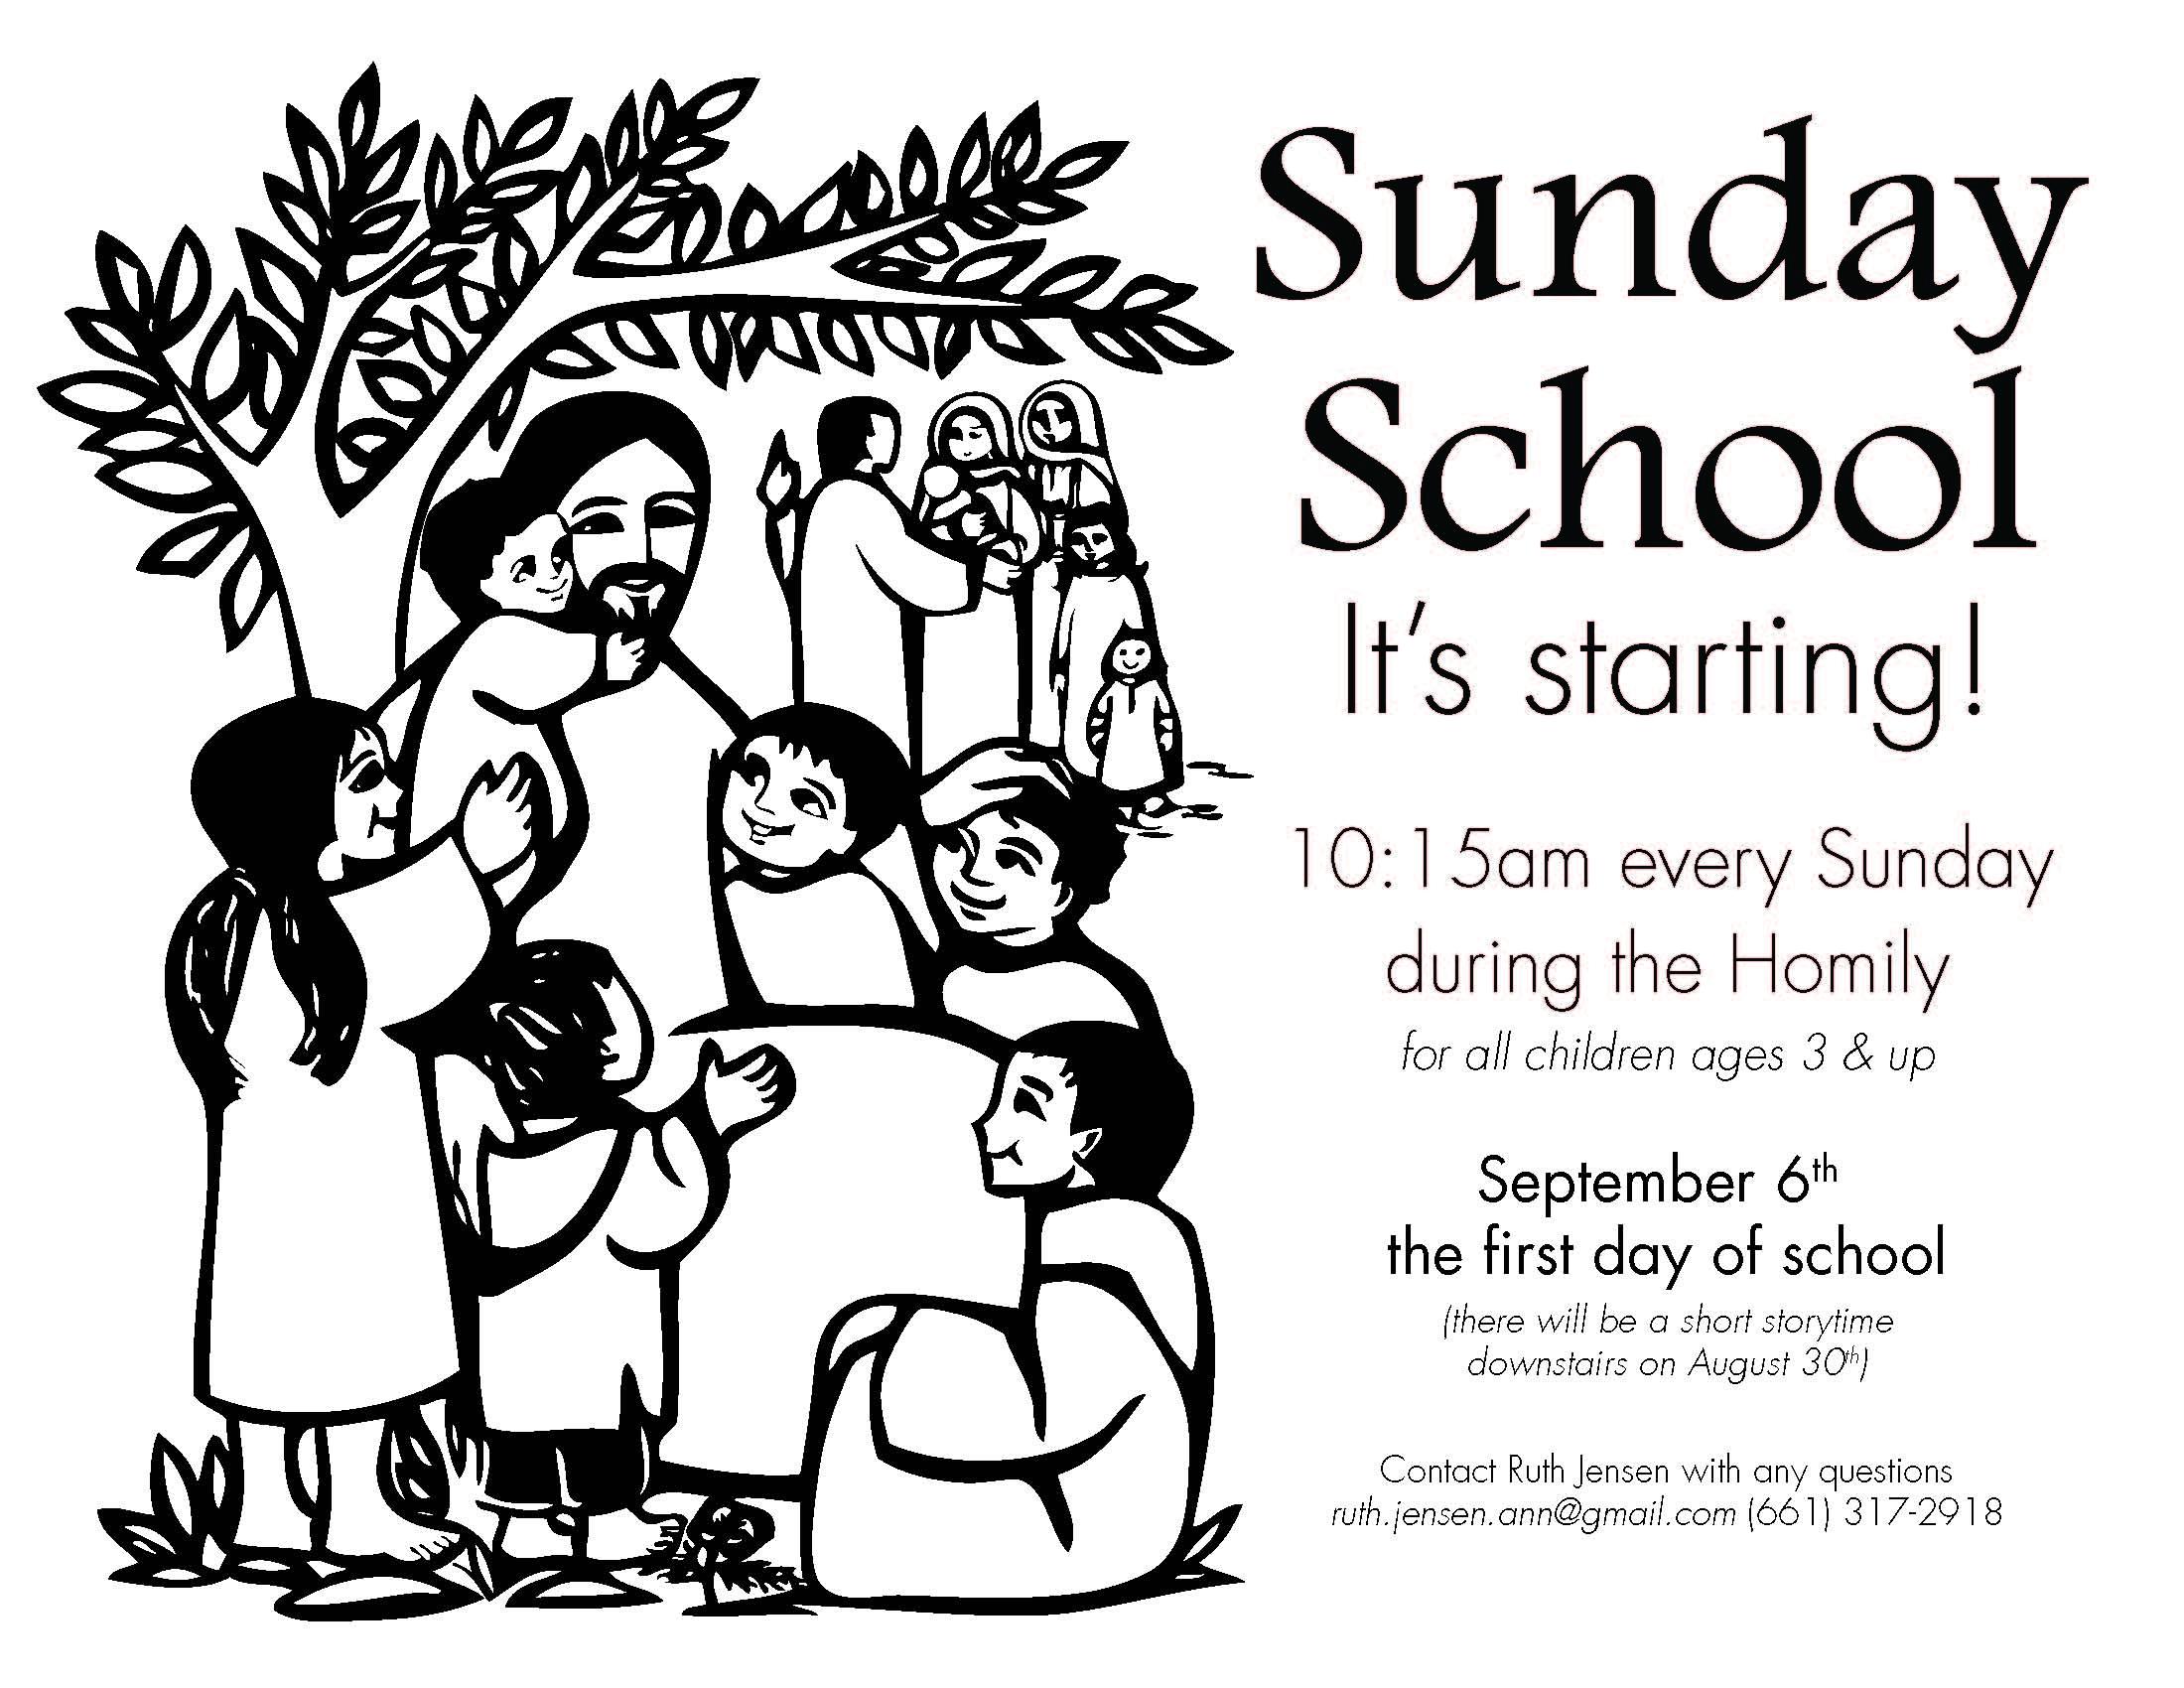 Sunday school flyer 2015